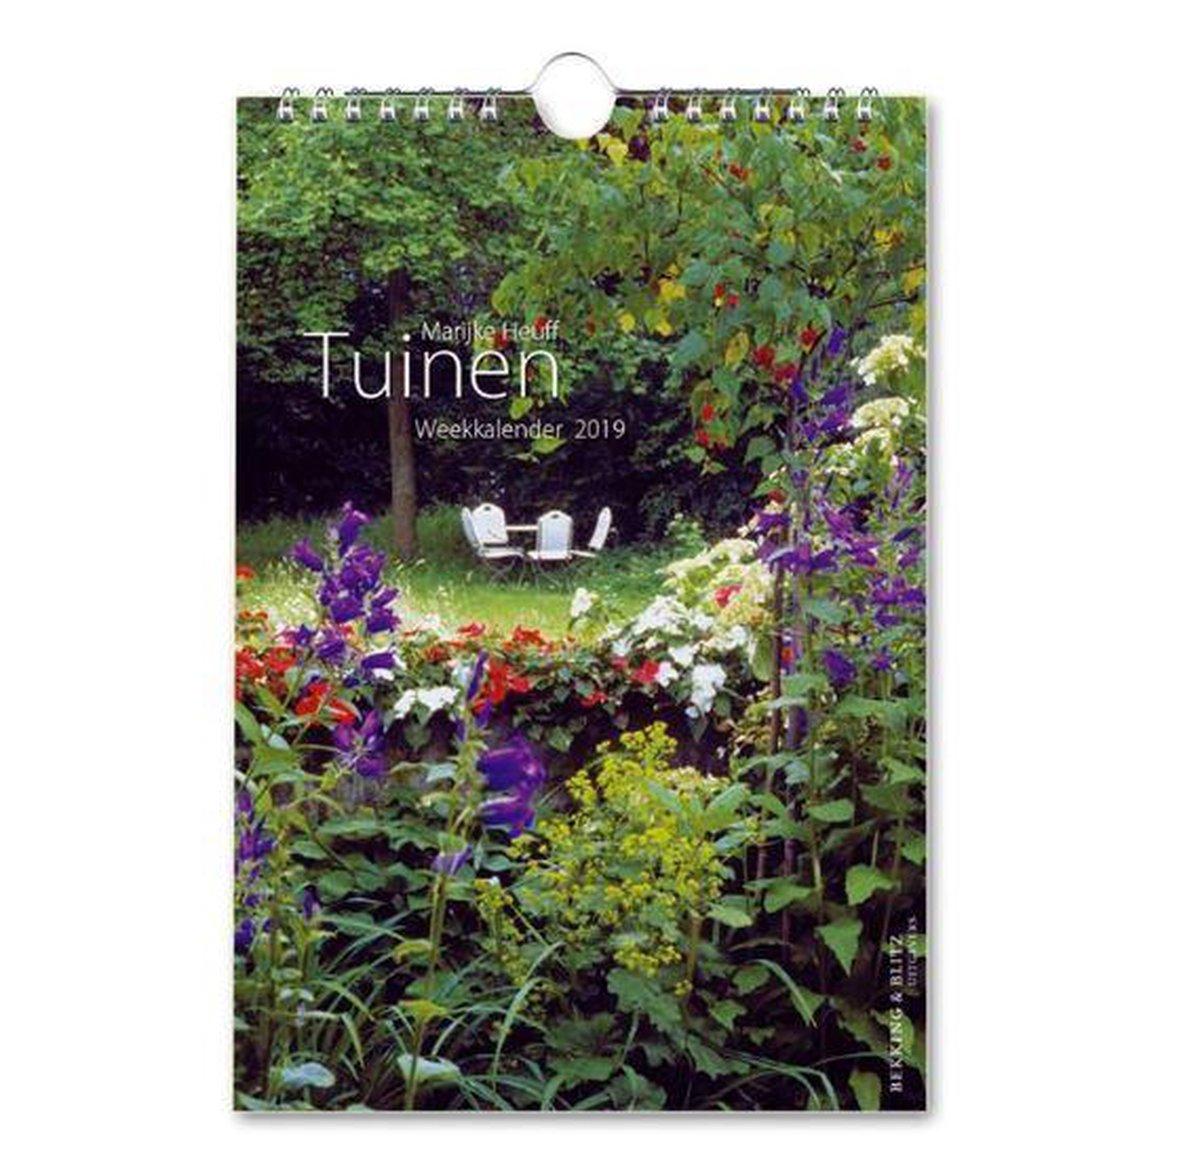 Weekkalender 2019 tuinen marijke heuff - Bekking & Blitz